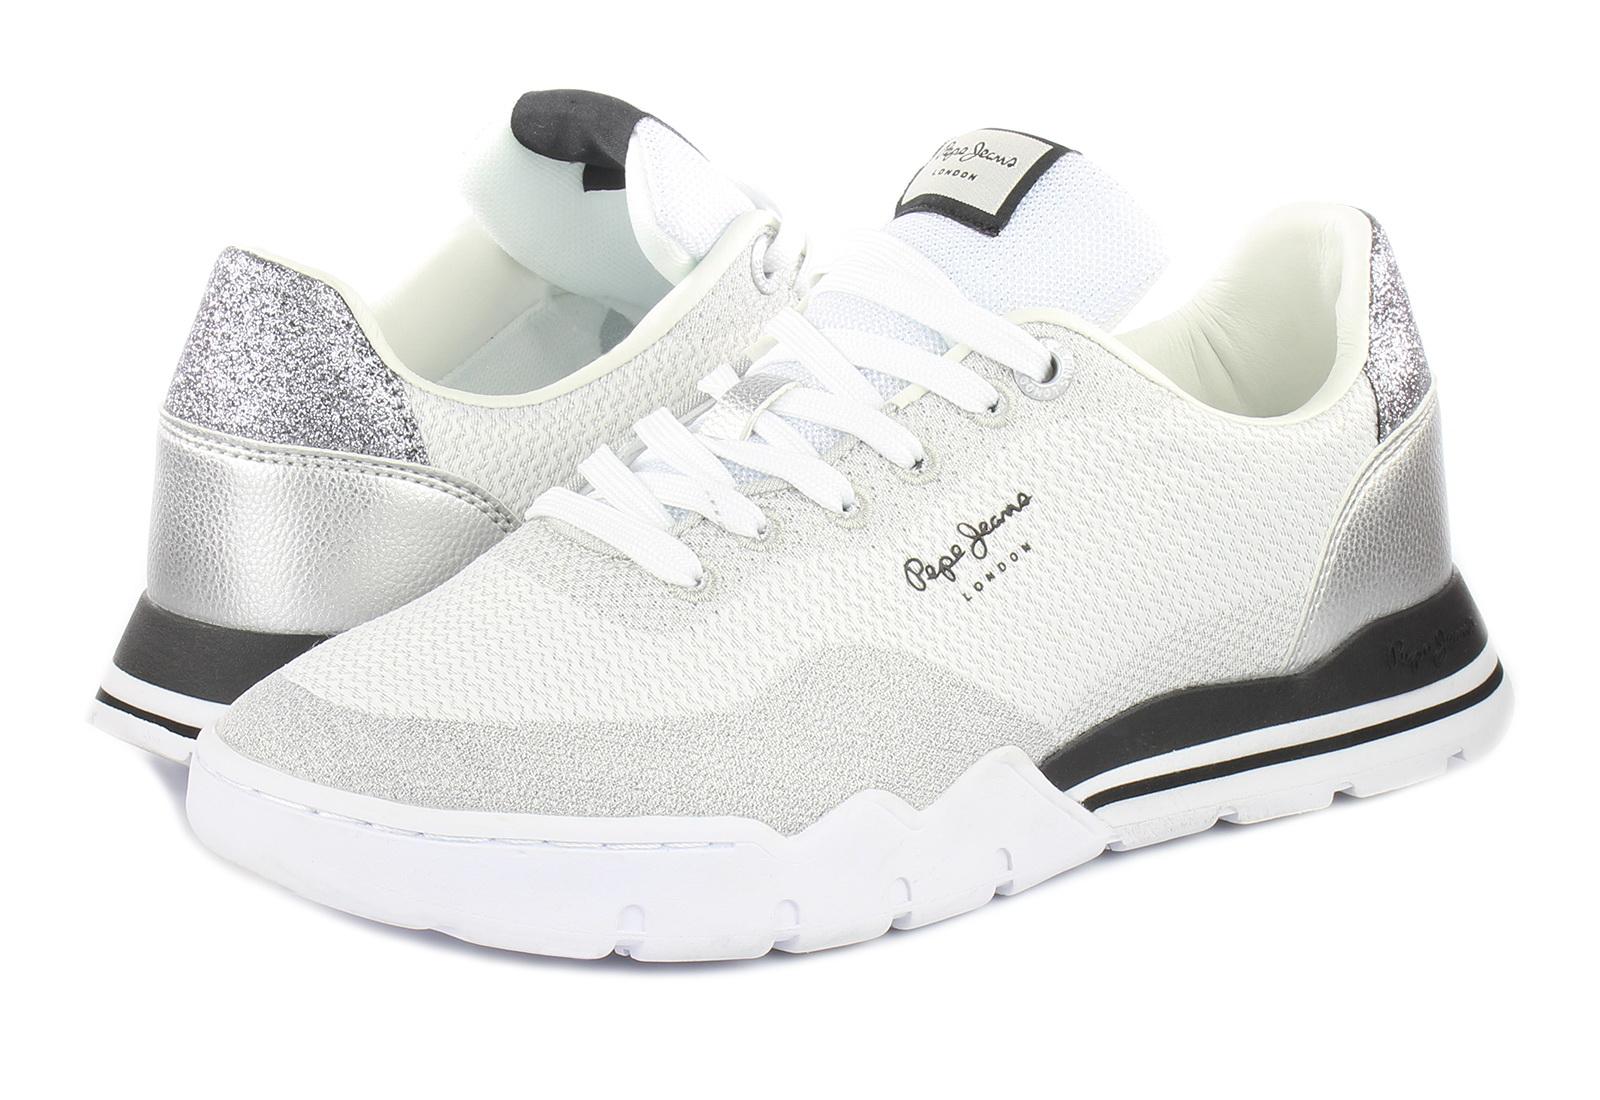 Pepe Jeans Pantofi Siena Woven Pls31125934 Office Shoes Romania